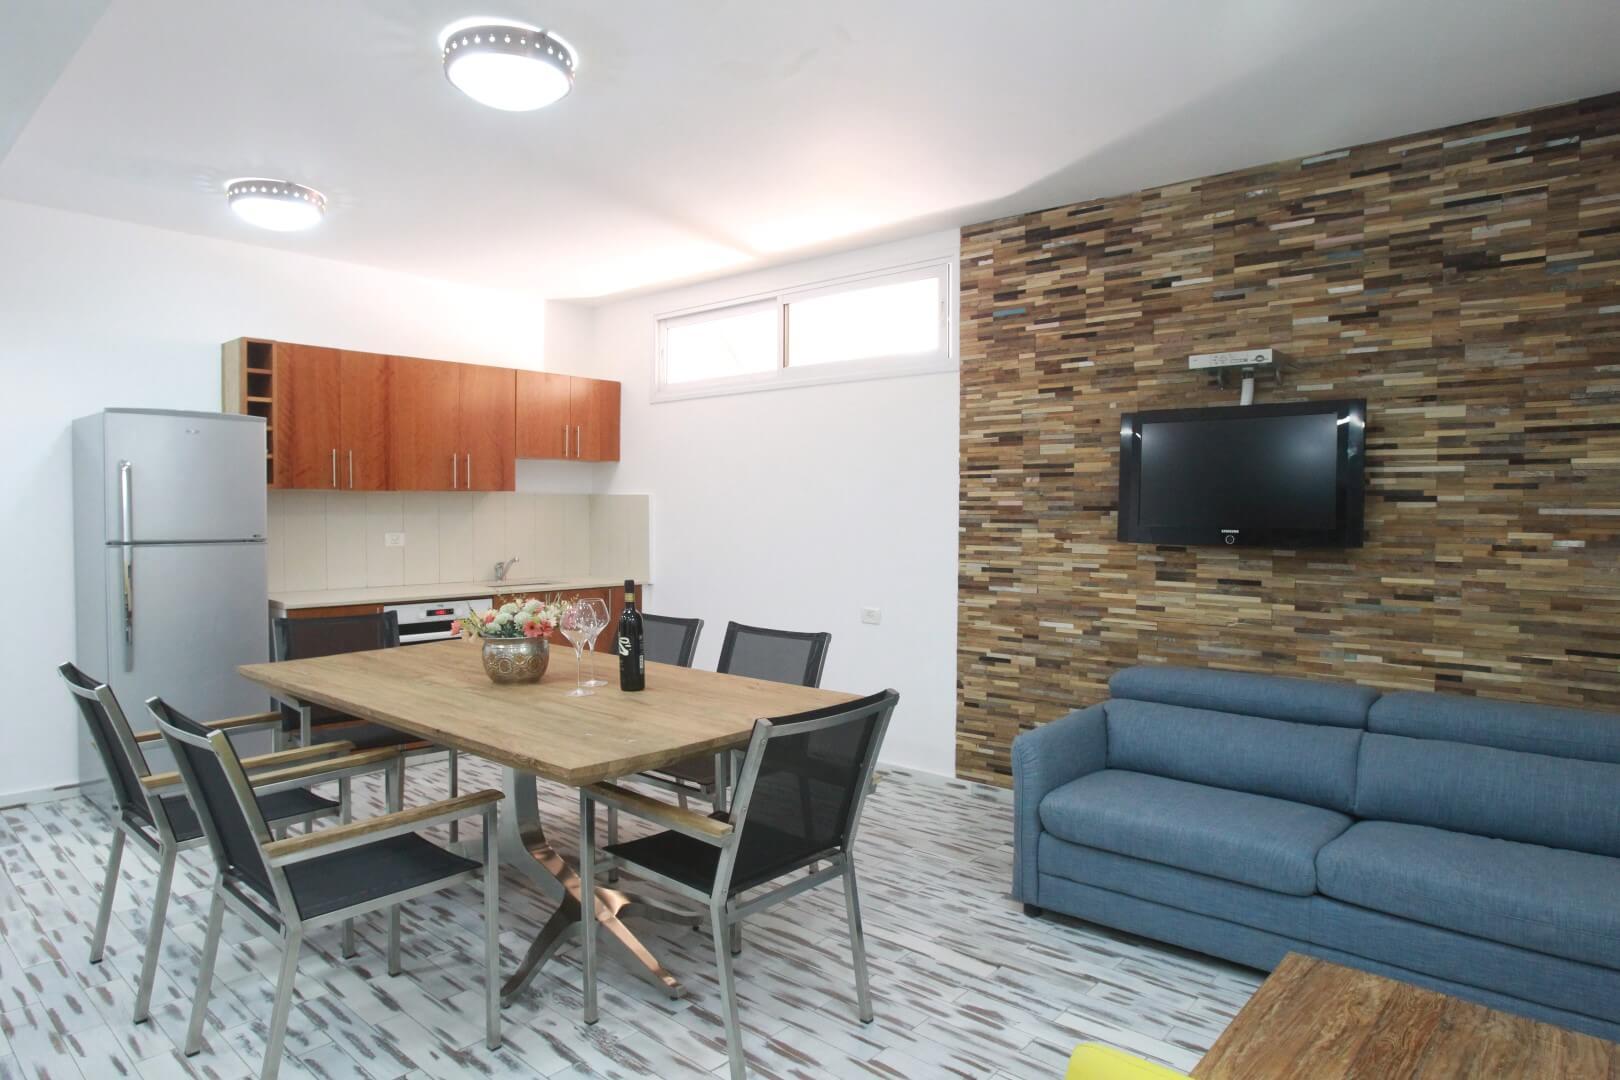 English basement apartment